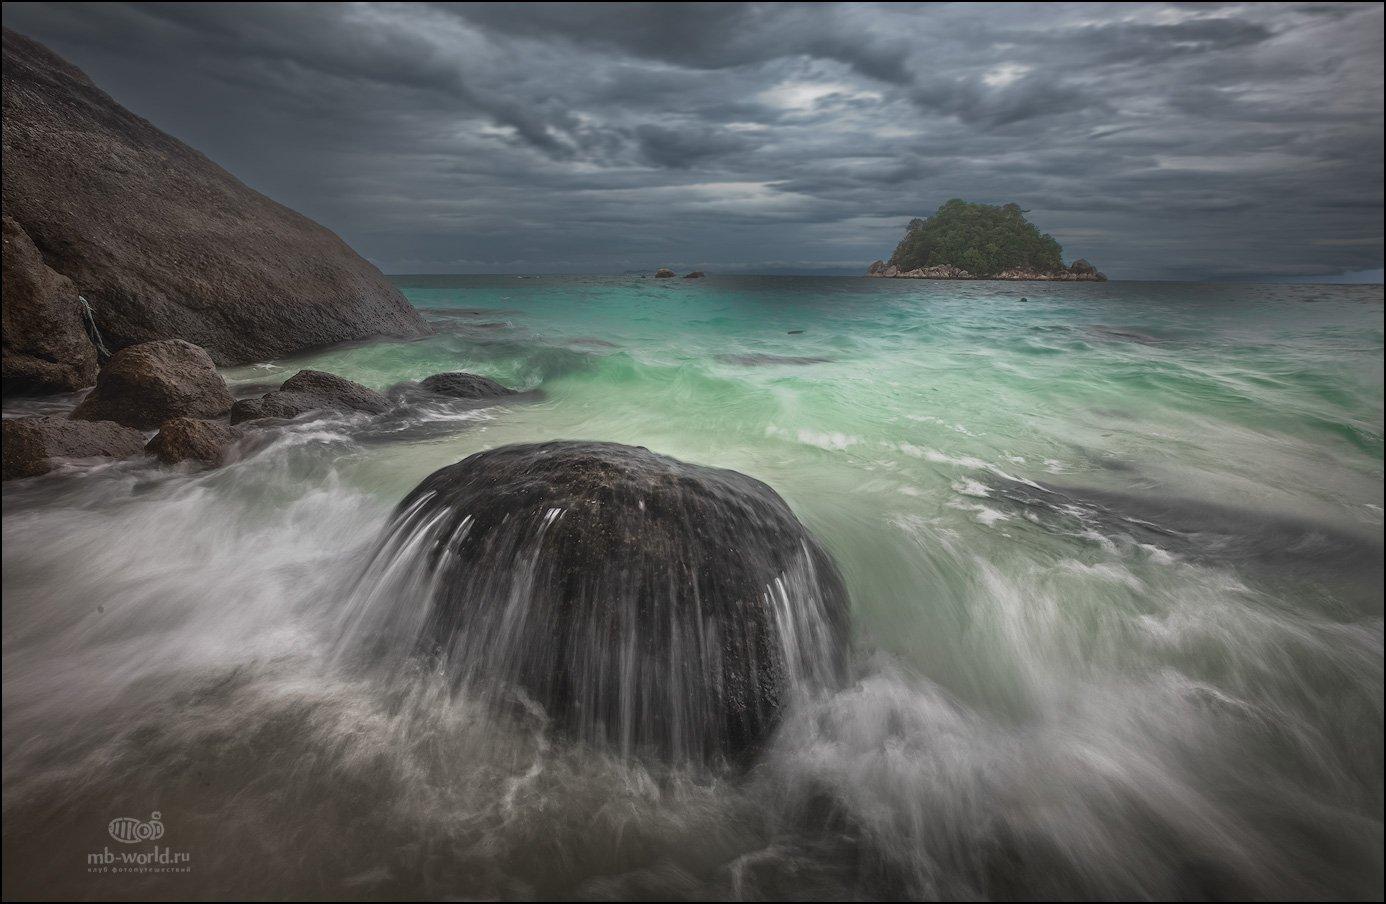 Таиланд, море, пейзаж, закат, , Mikhail Vorobyev